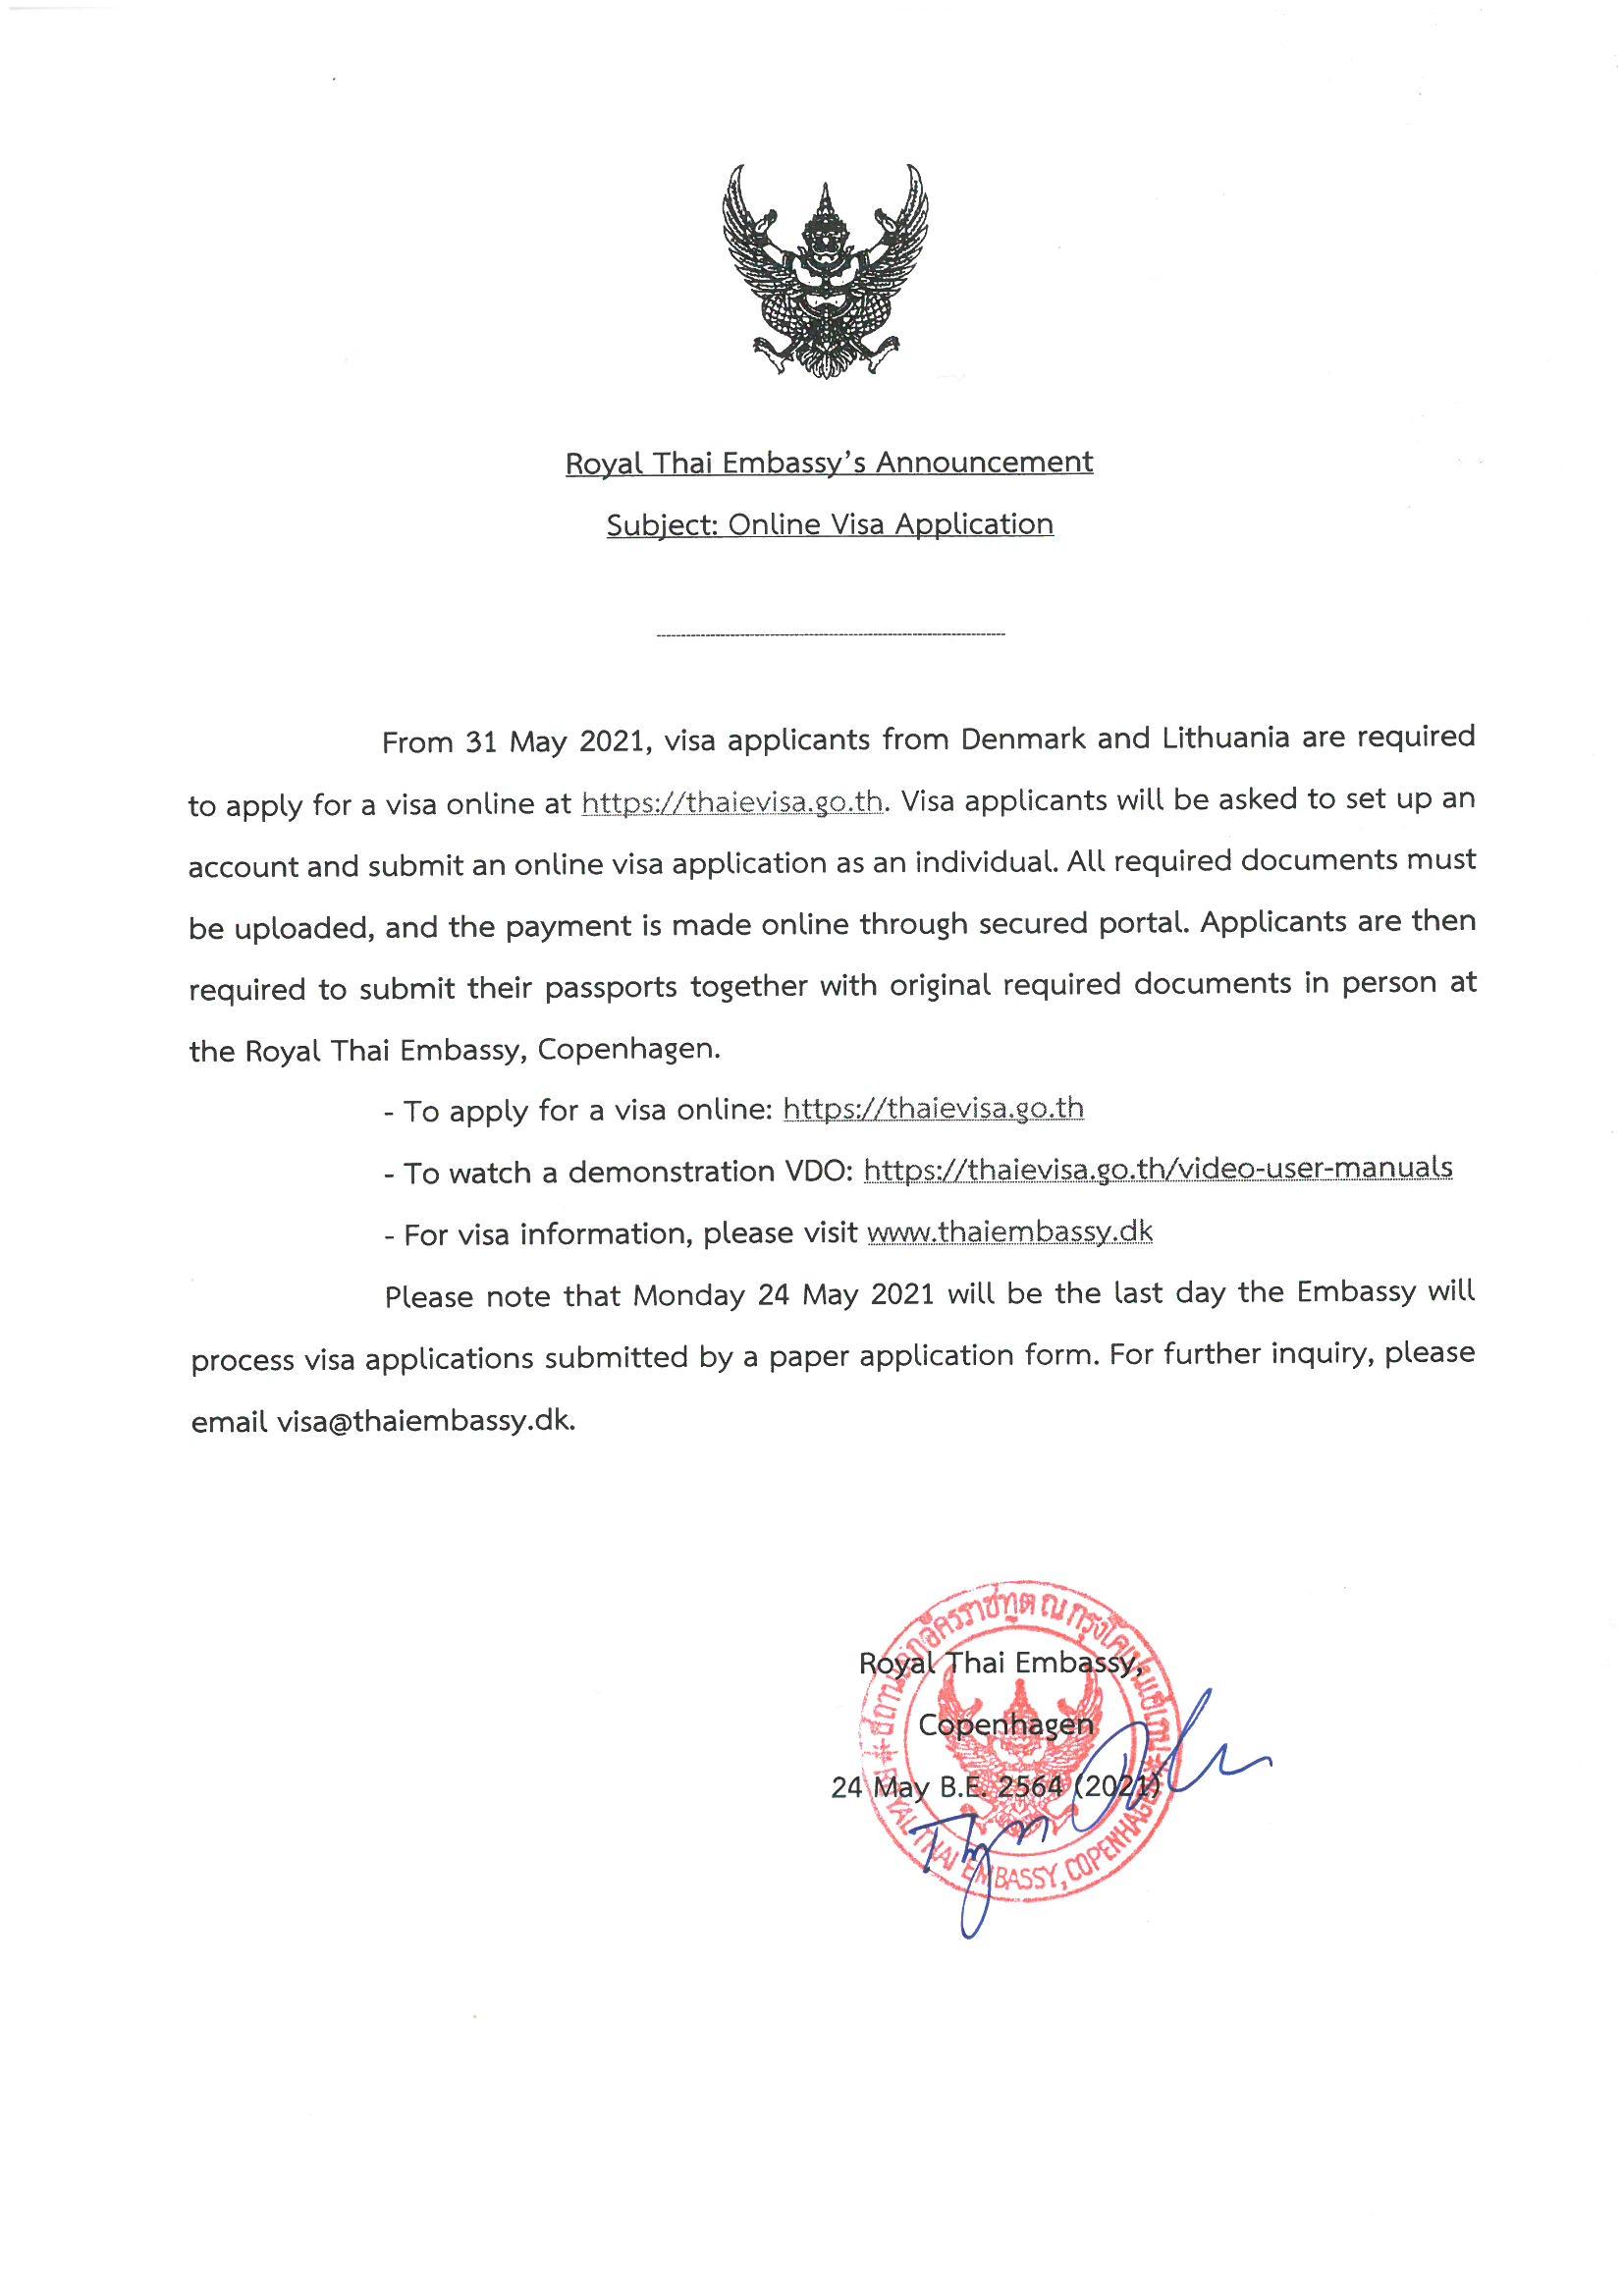 www.thai-dk.dk/uploads/RTE_Announcement-24-MAY-2021.jpg